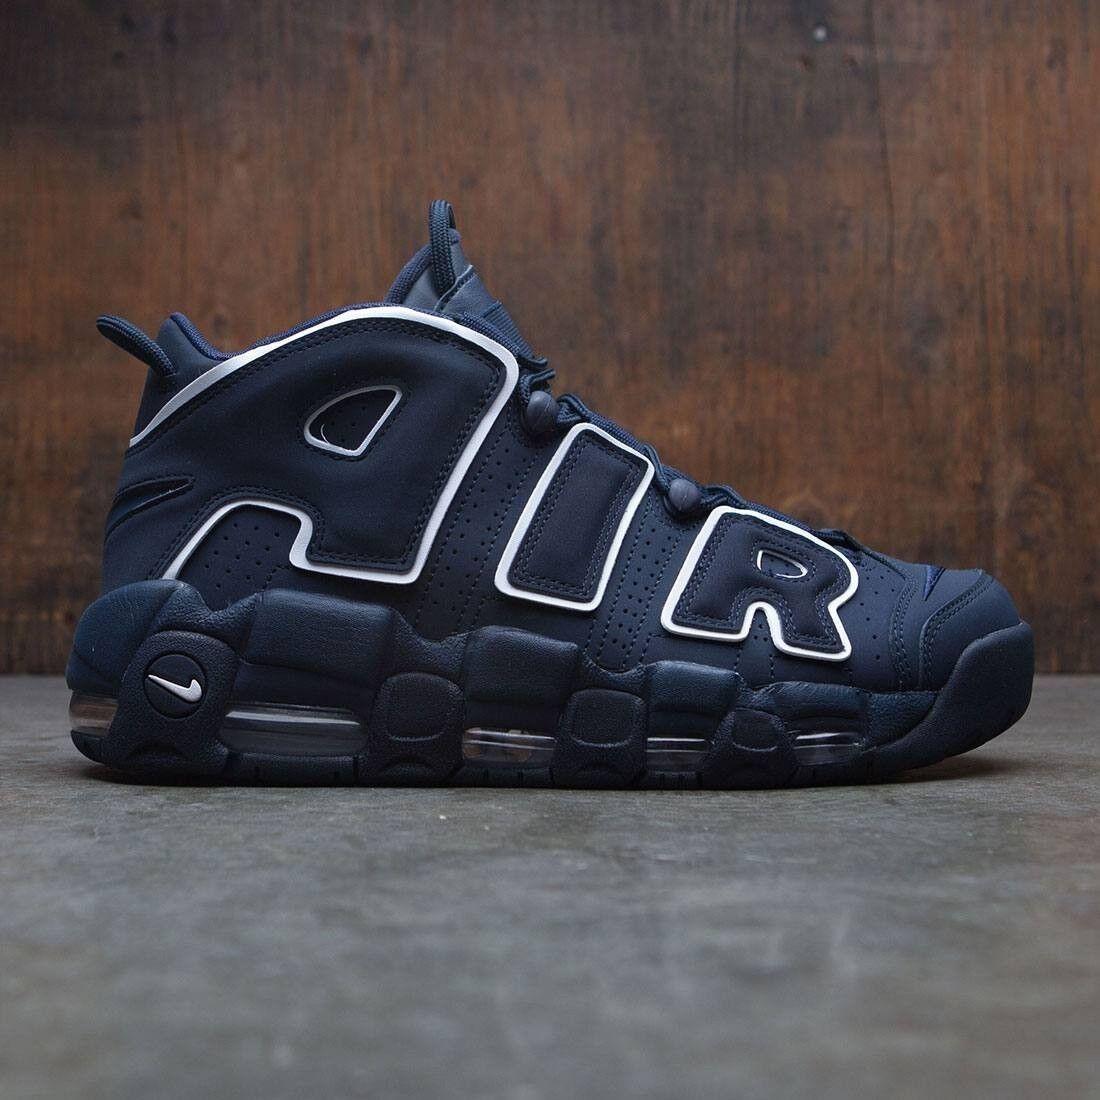 Nike More Uptempo 96 Obsidian Size 12. 921948-400 Jordan Kobe Pippen